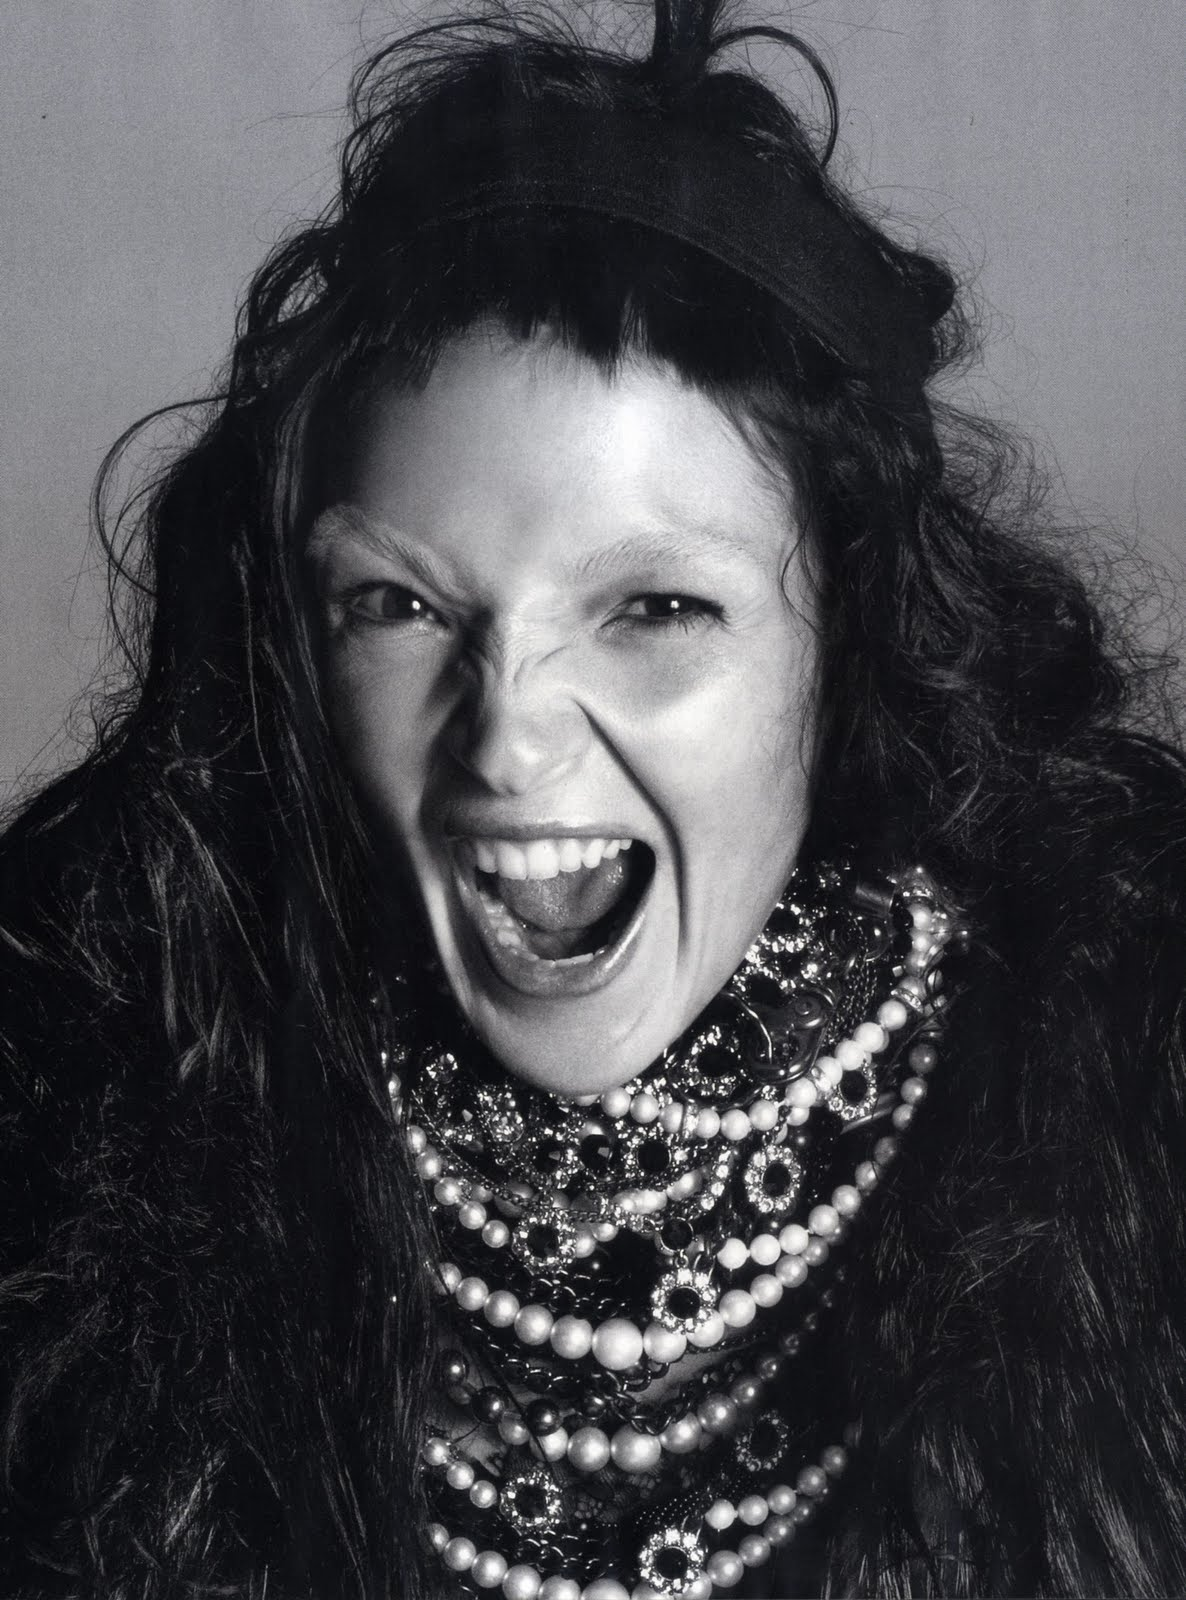 http://2.bp.blogspot.com/_uB-BSH_BgAs/TKXw1SlZsDI/AAAAAAAALtM/Bi-foI6SJHs/s1600/October+2010+Italian+Vogue+photo+Steven+Meisel+stylist+Panos+Yiapanis+model+Mariacarla+Boscono+Women+Management+NYC+Blog+8.jpg